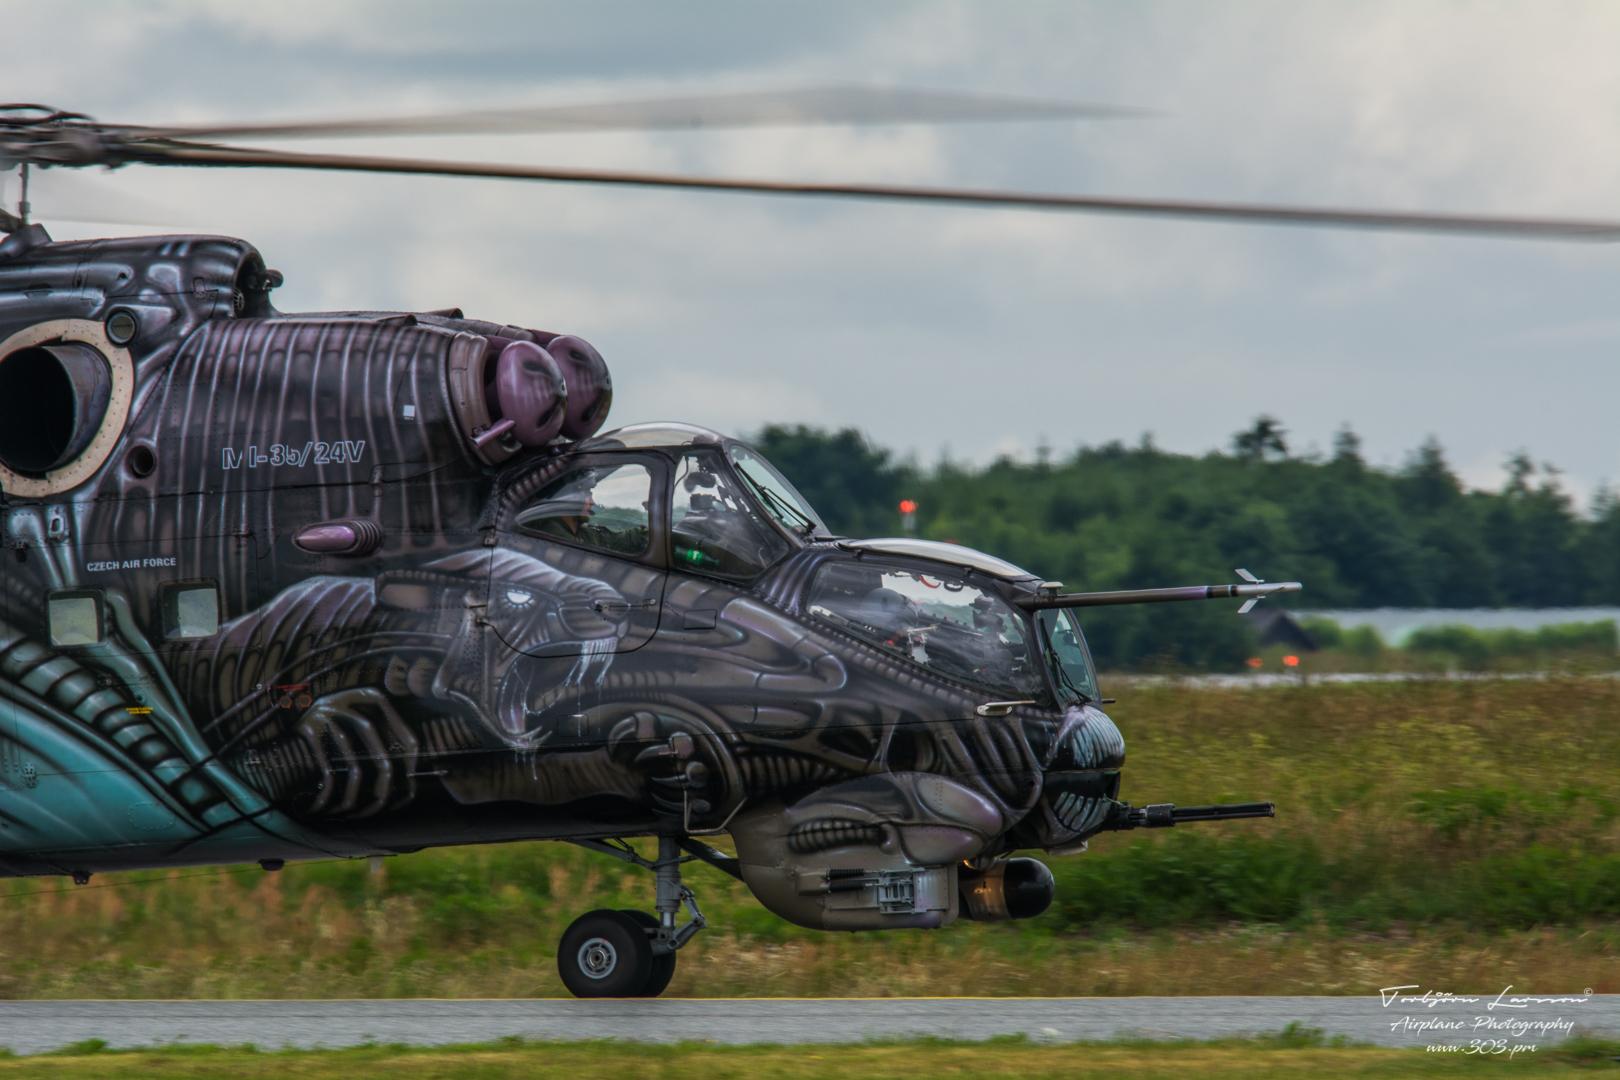 MI-35 HIND - Czech Air Force